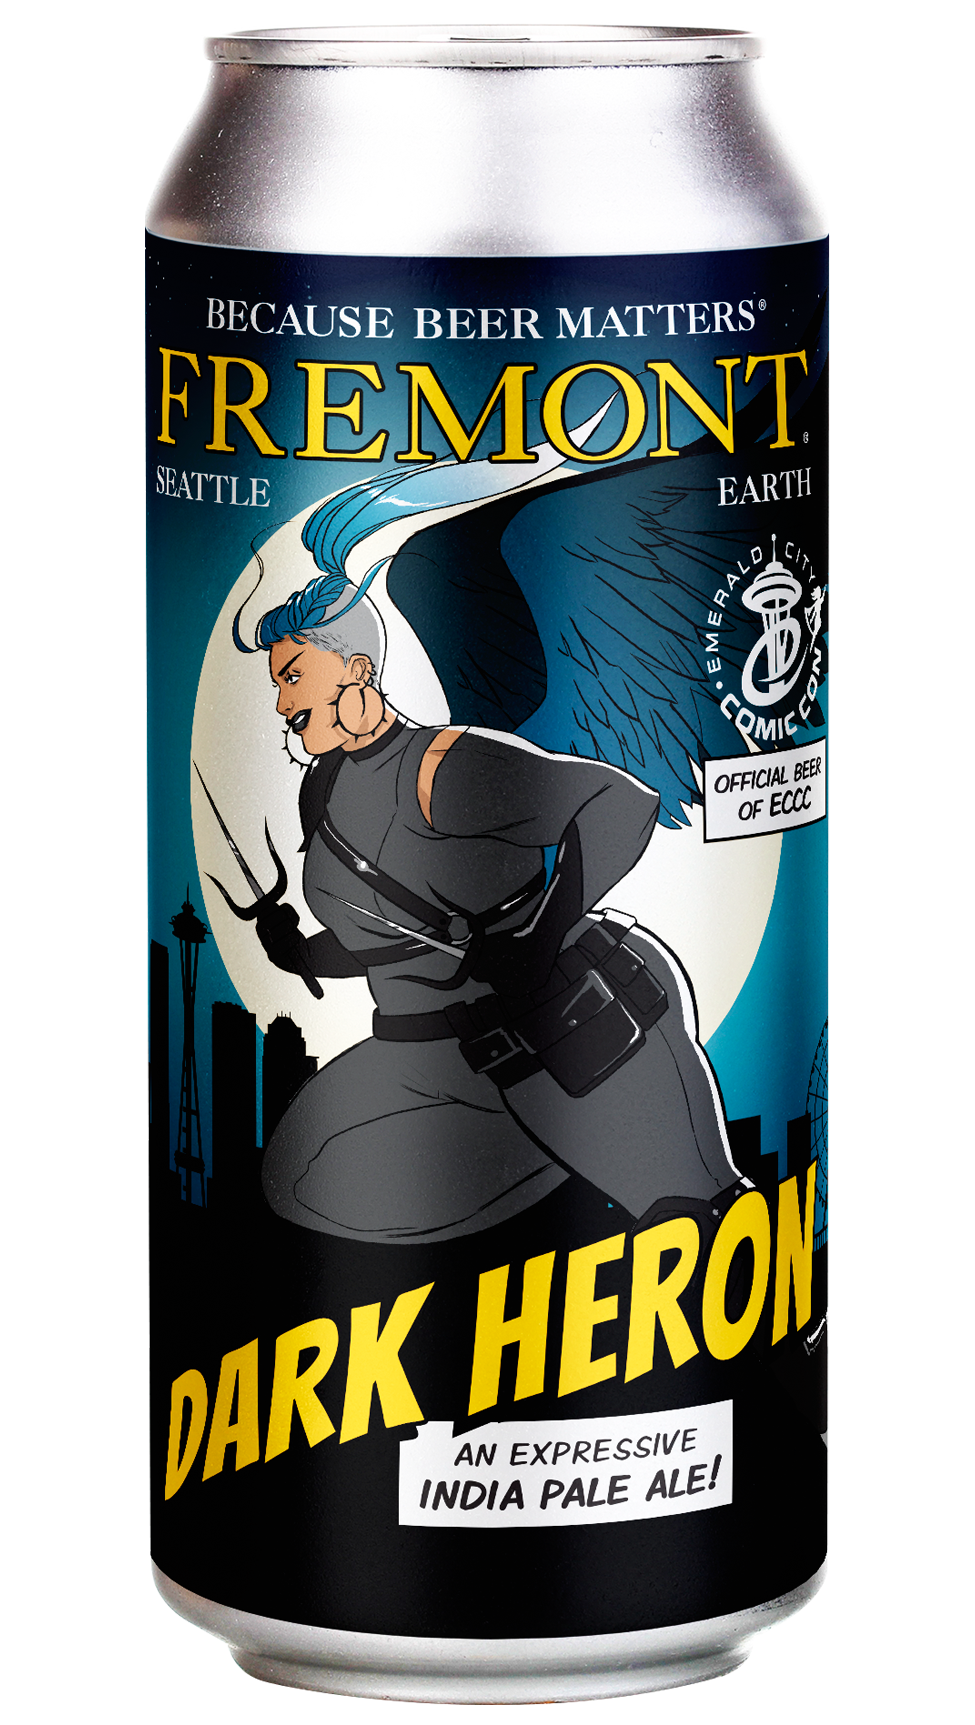 Dark Heron 16oz can